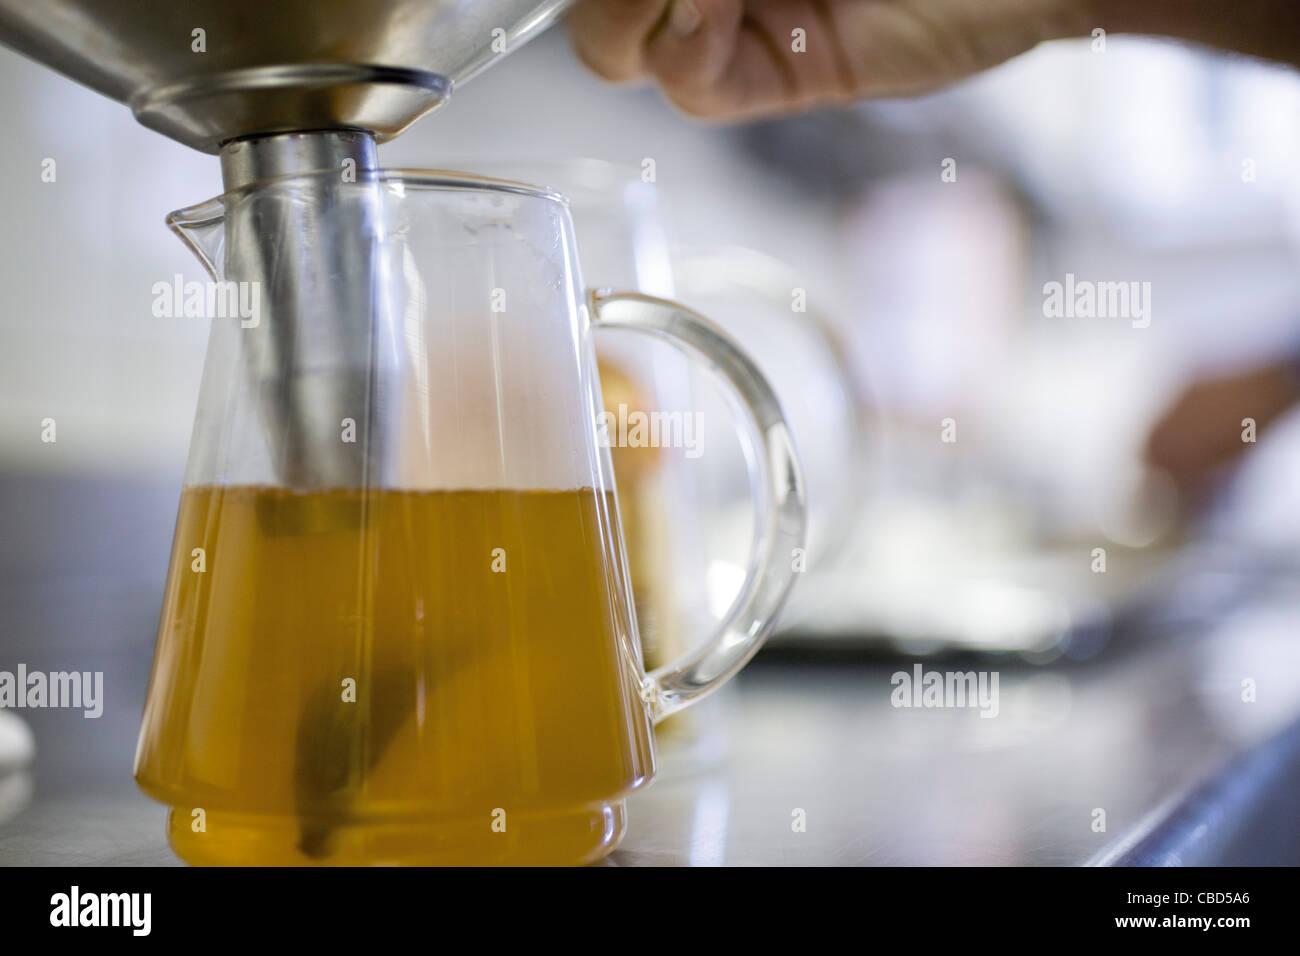 Preparing pitcher of tea - Stock Image